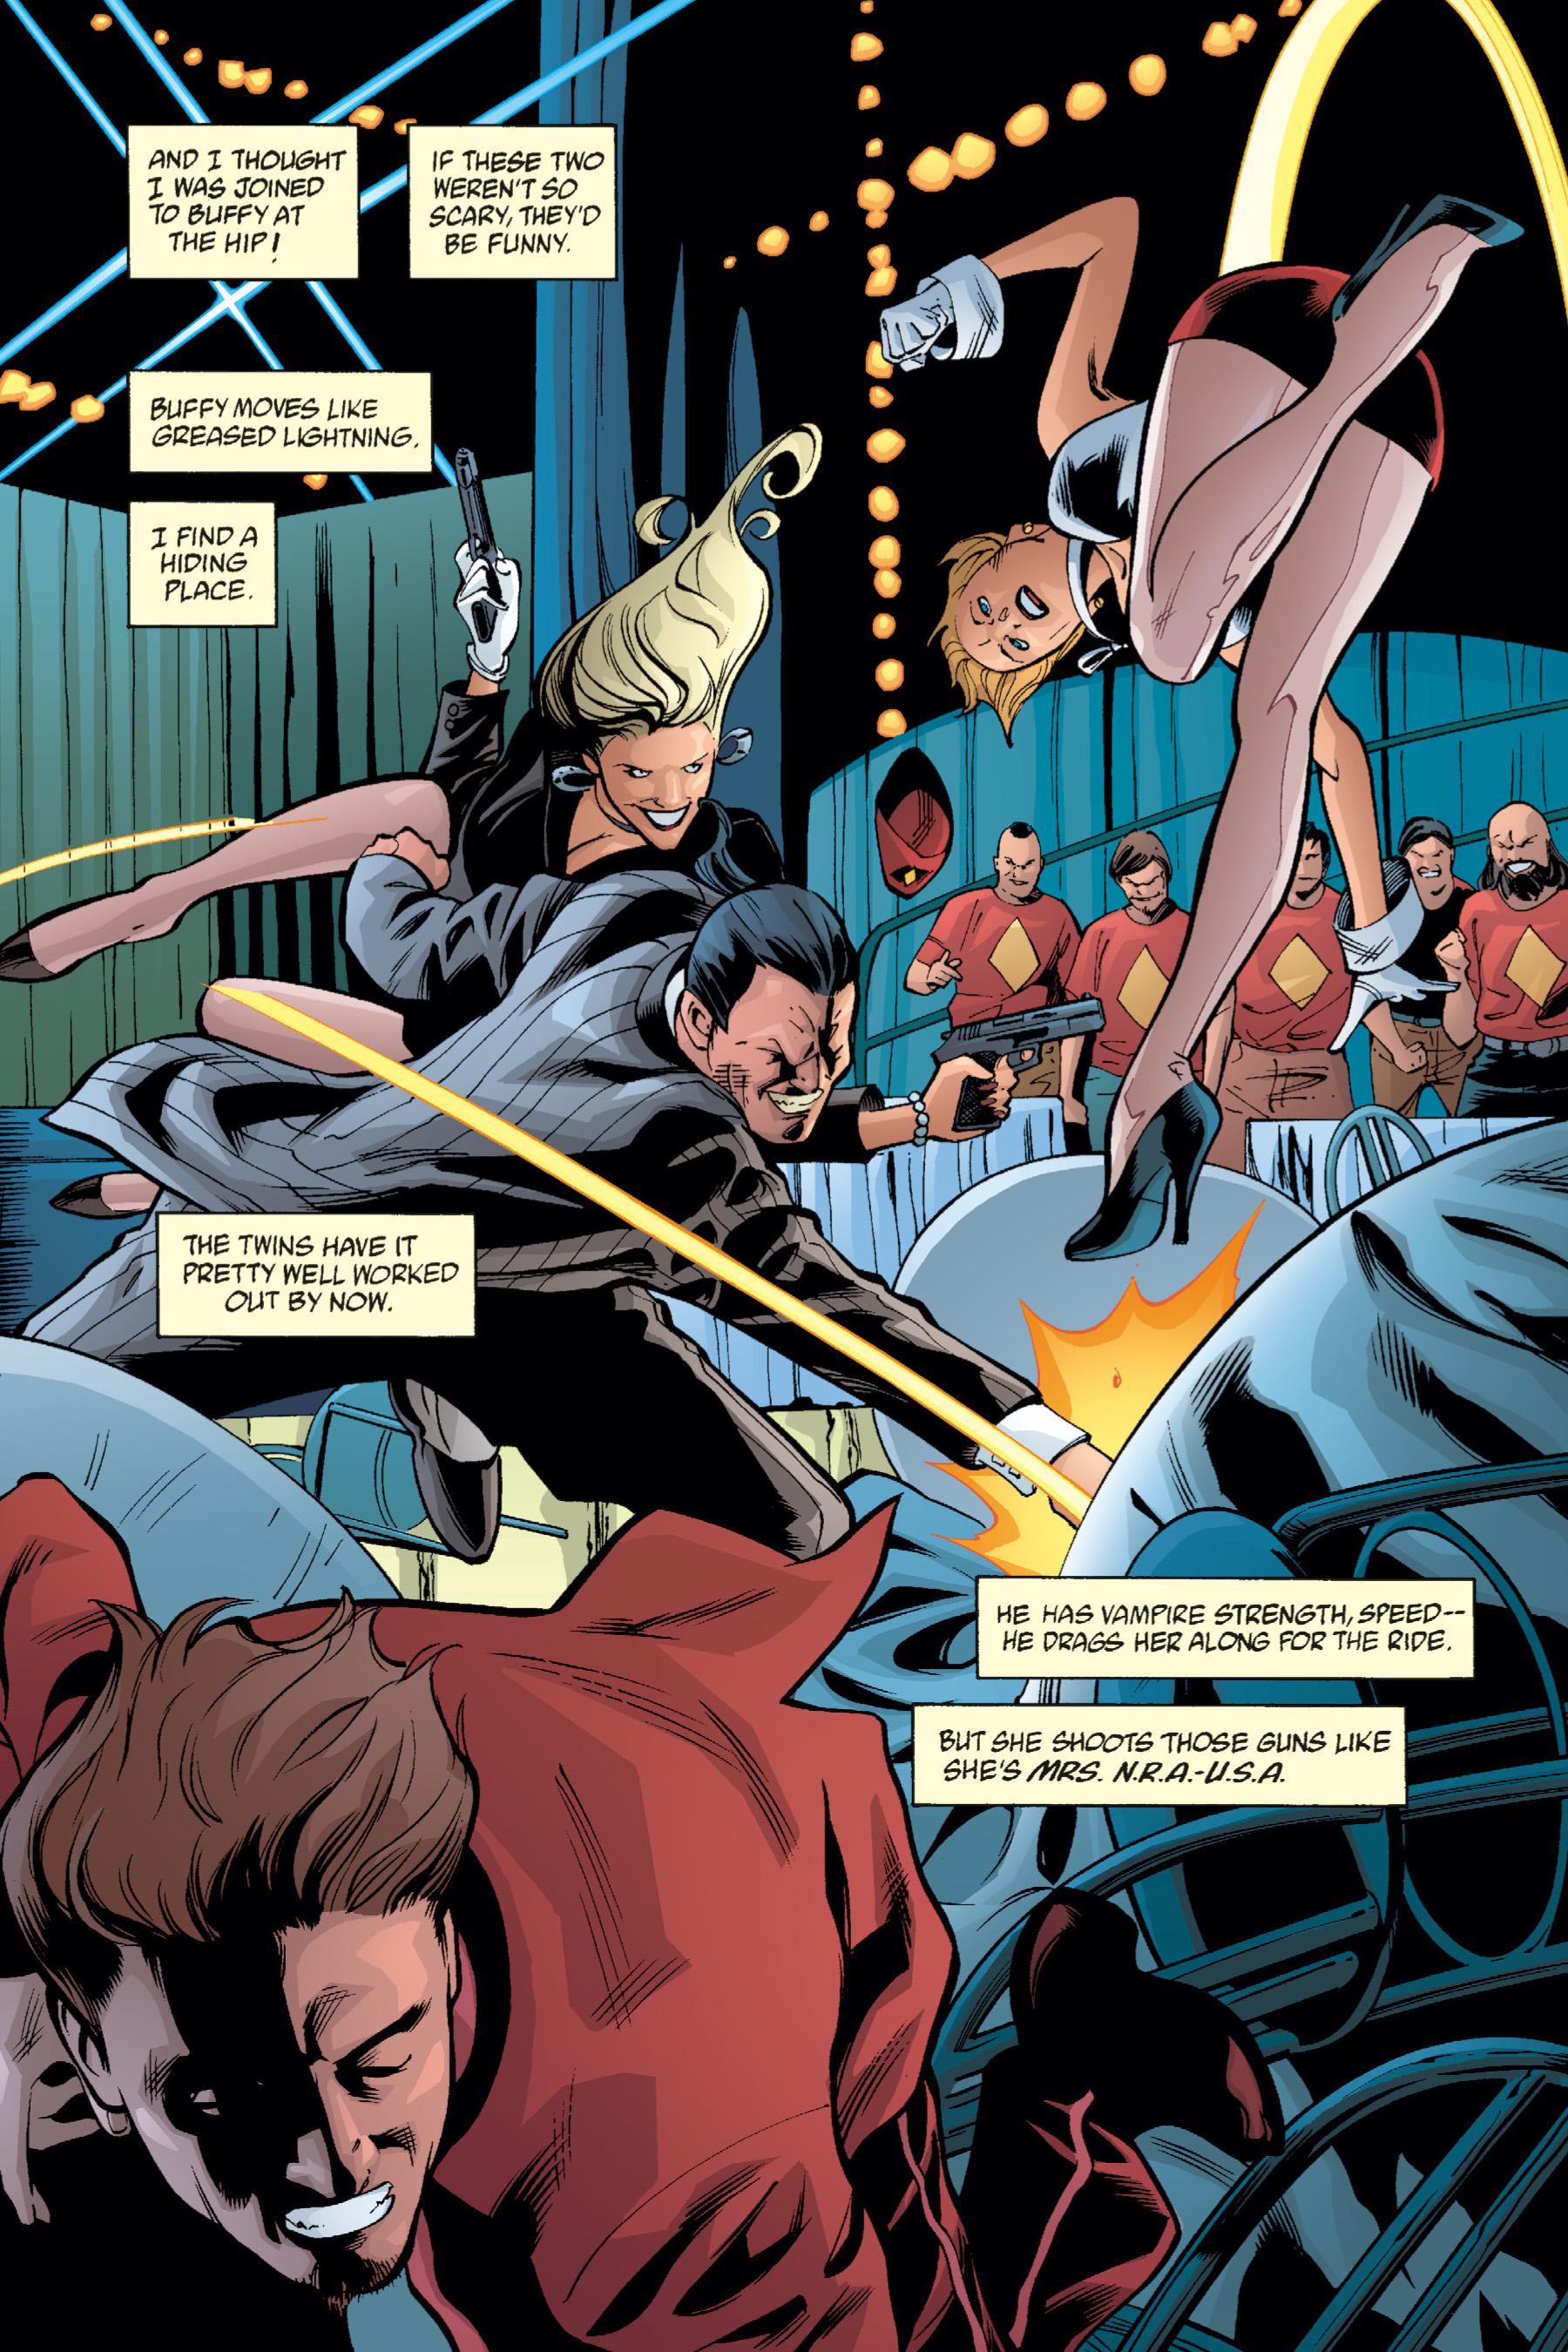 Read online Buffy the Vampire Slayer: Omnibus comic -  Issue # TPB 1 - 160